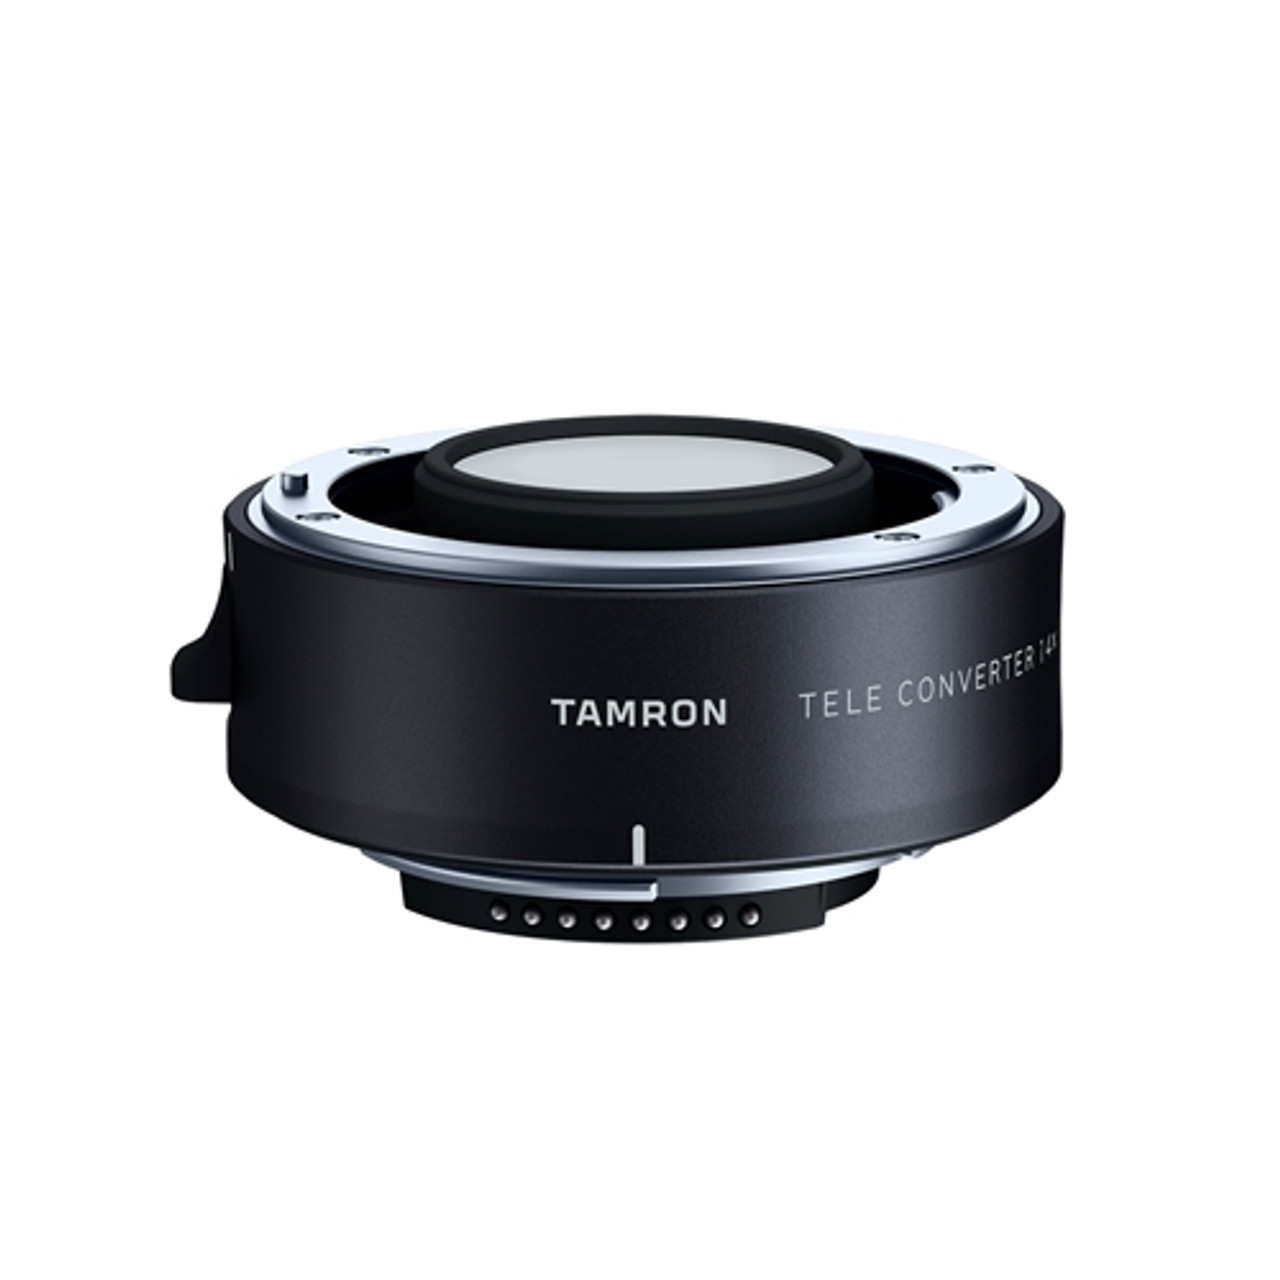 TAMRON TC-X14 1.4X TELECONVERTER CANON